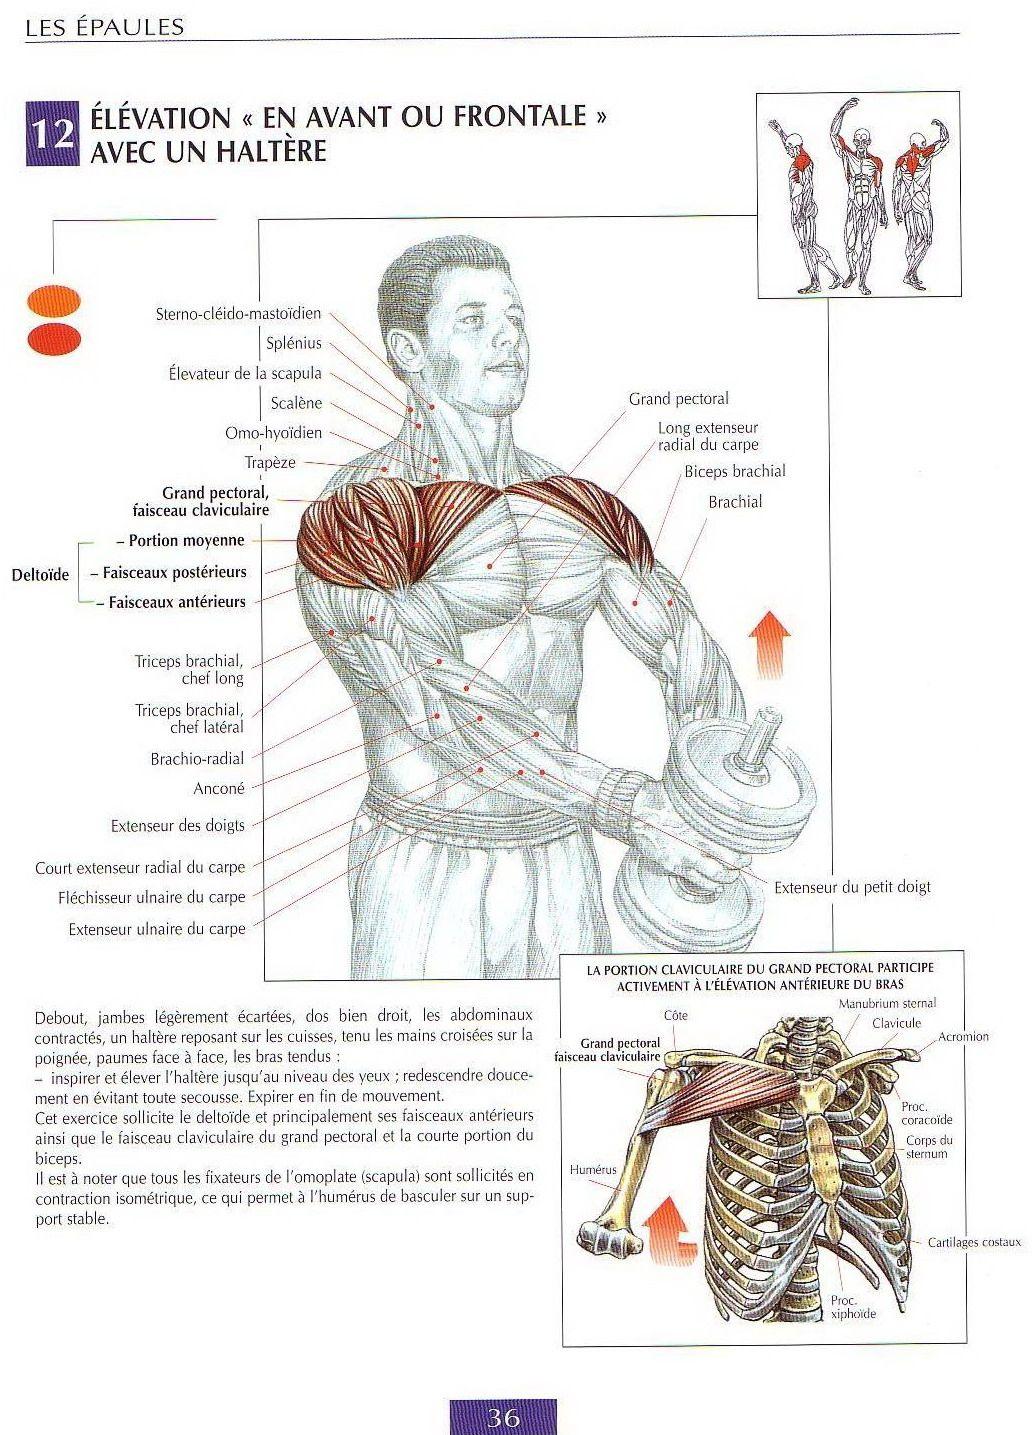 Page+036.jpg 1 032 × 1 435 pixels | Exercice musculation, Musculation prise de masse, Fitness et ...